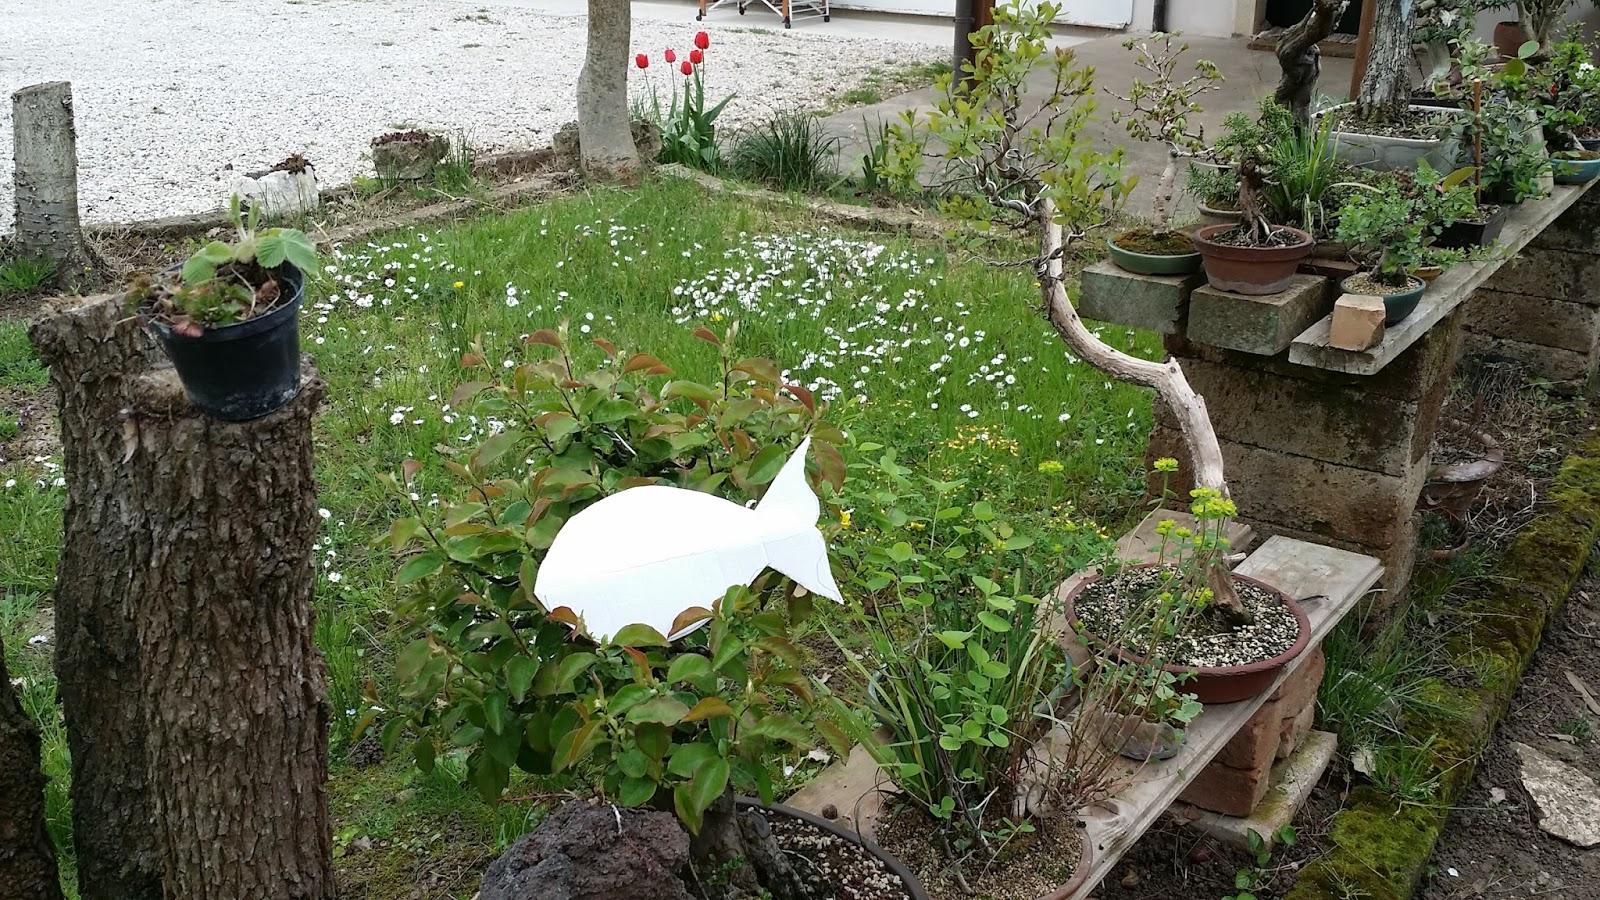 Giorgitudini poissons dans le jardin for Dans le jardin